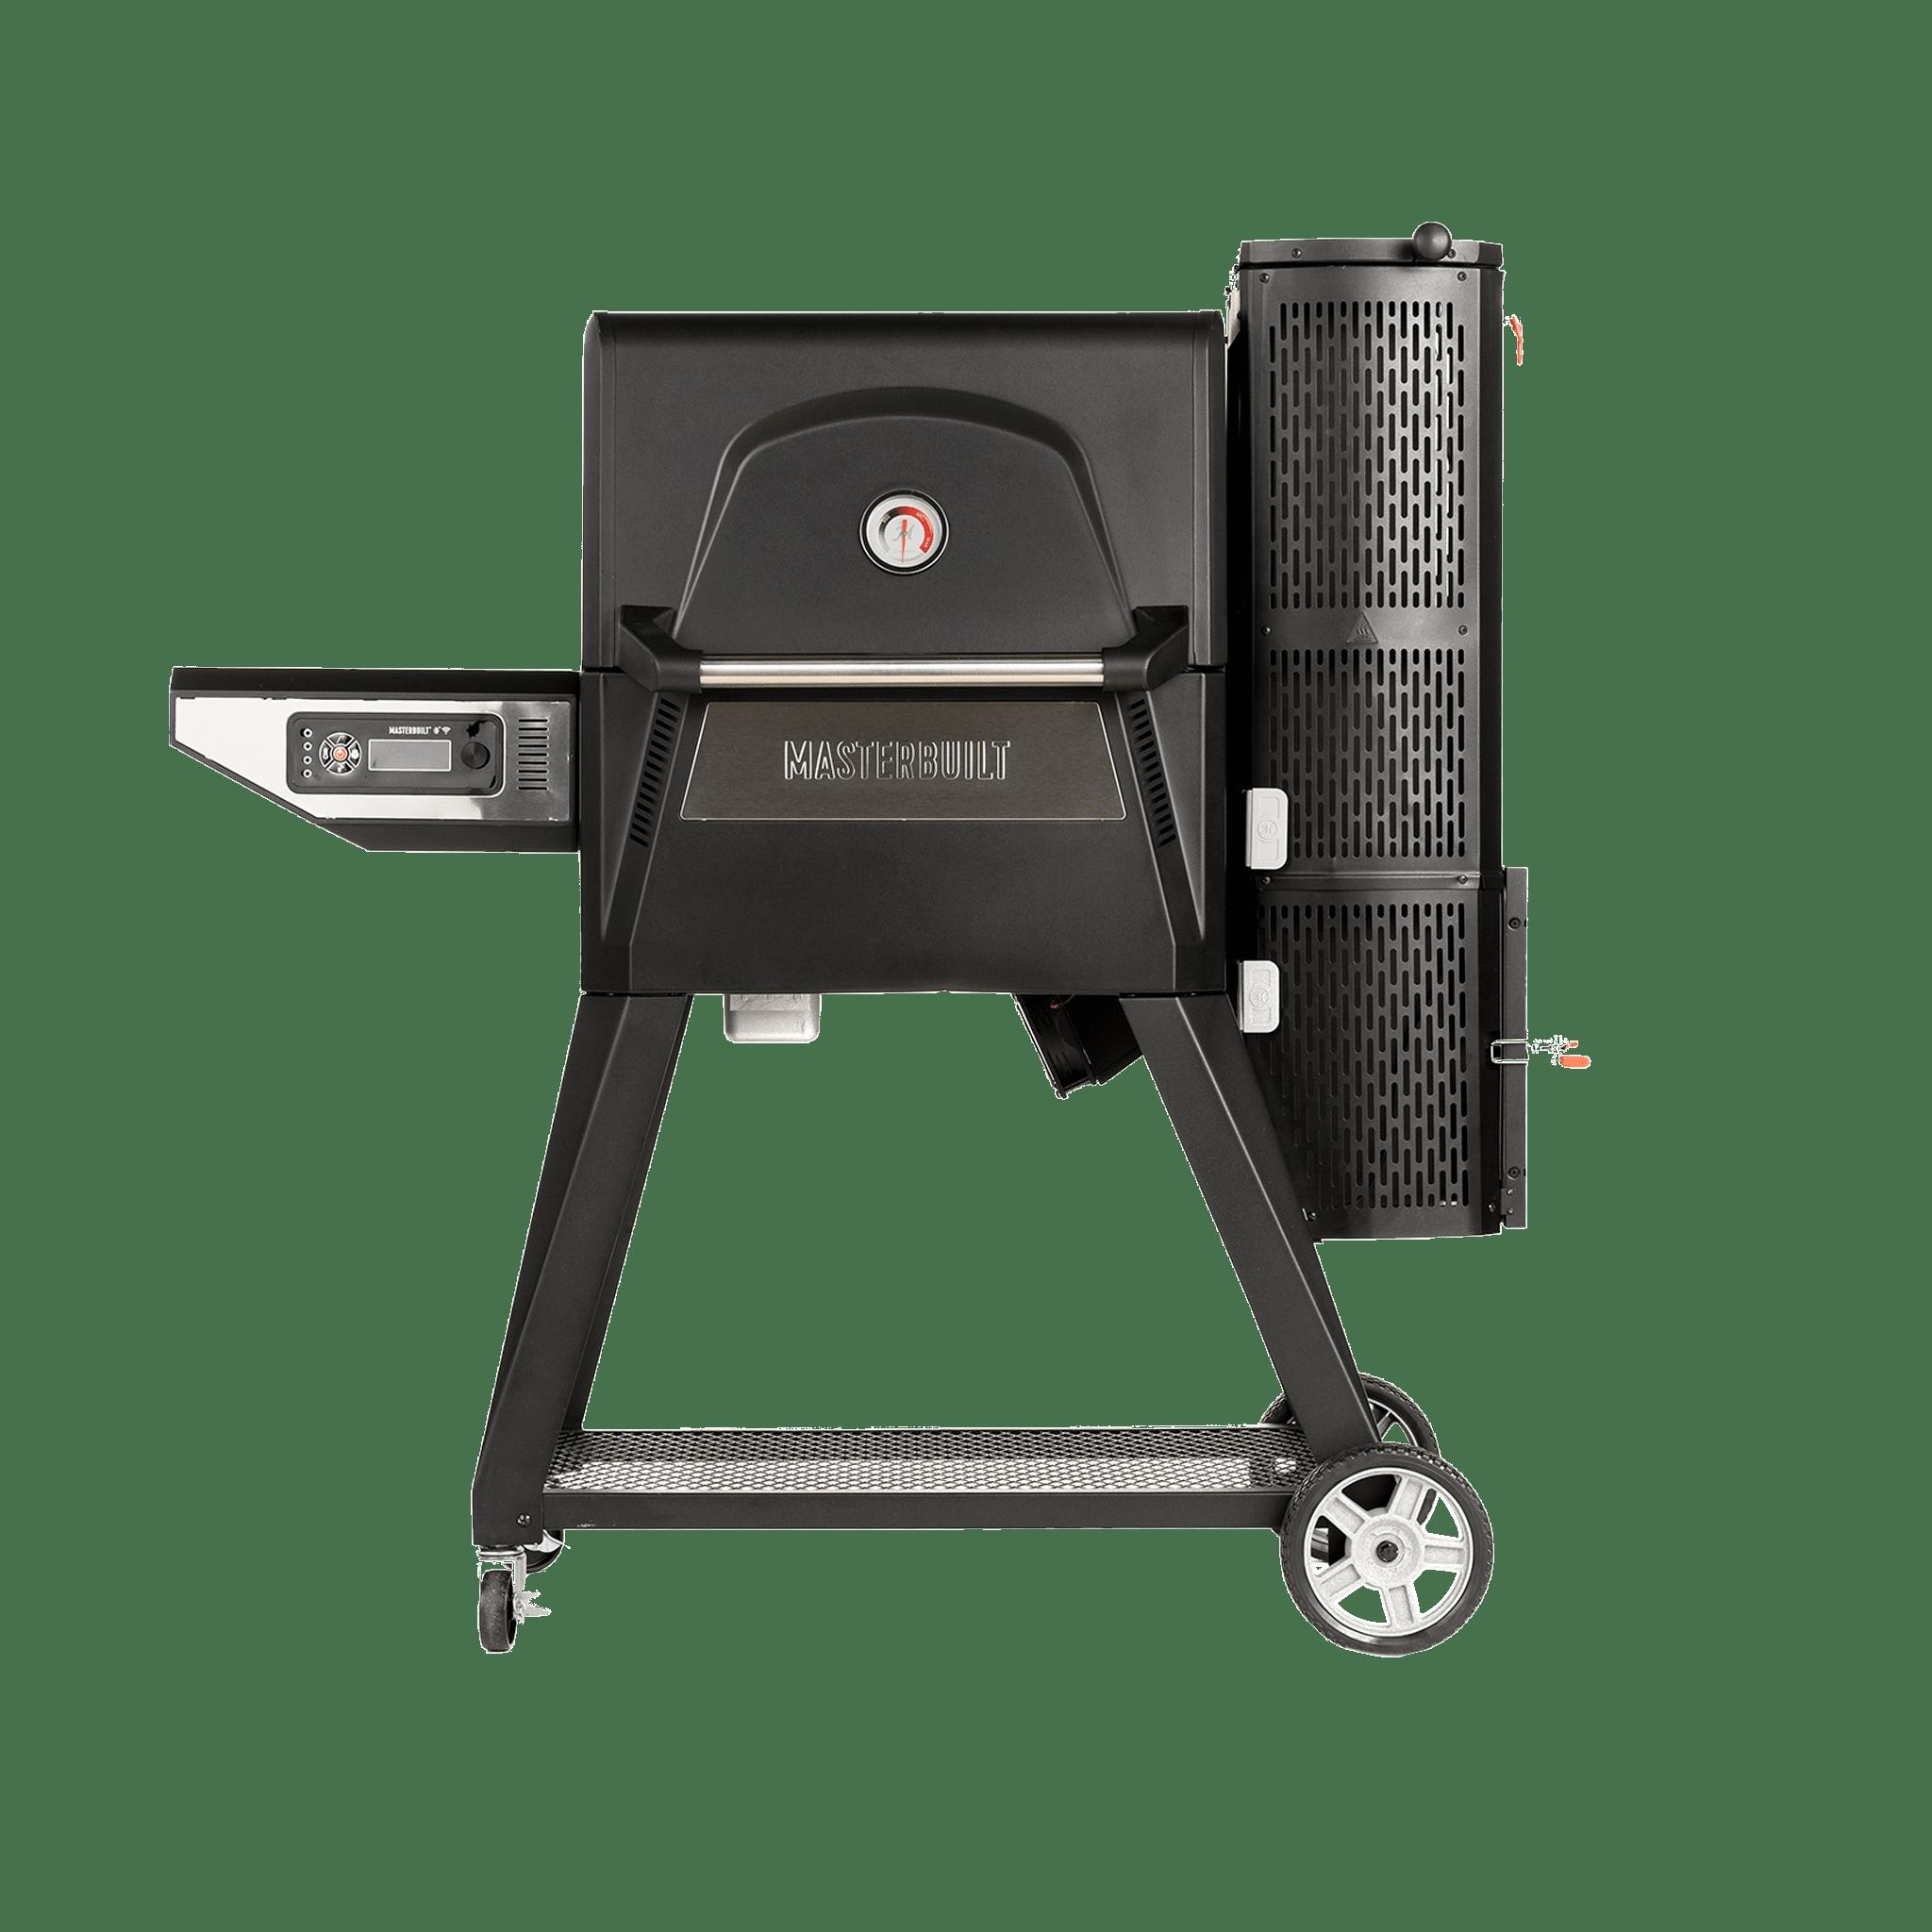 Masterbuilt Gravity Series 560 Digital Charcoal Grill Smoker